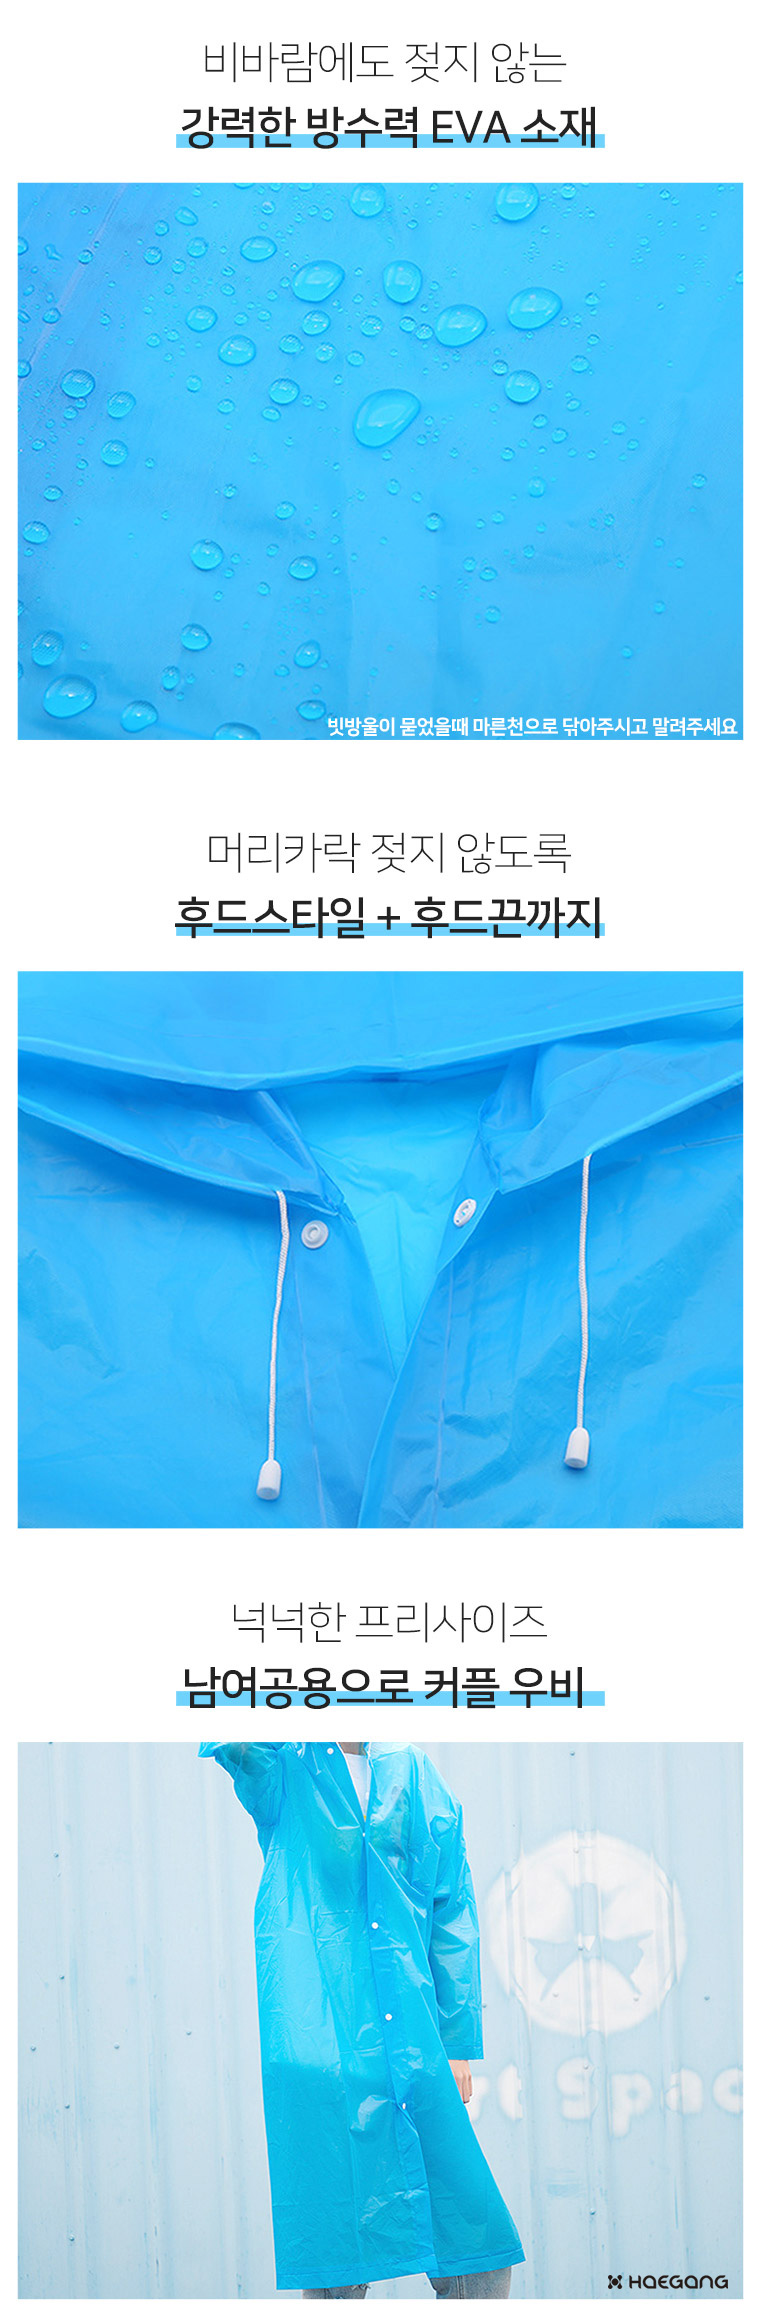 EVA 레인코트 우비 - 세일덕, 4,000원, 레인코트/소품, 레인코트